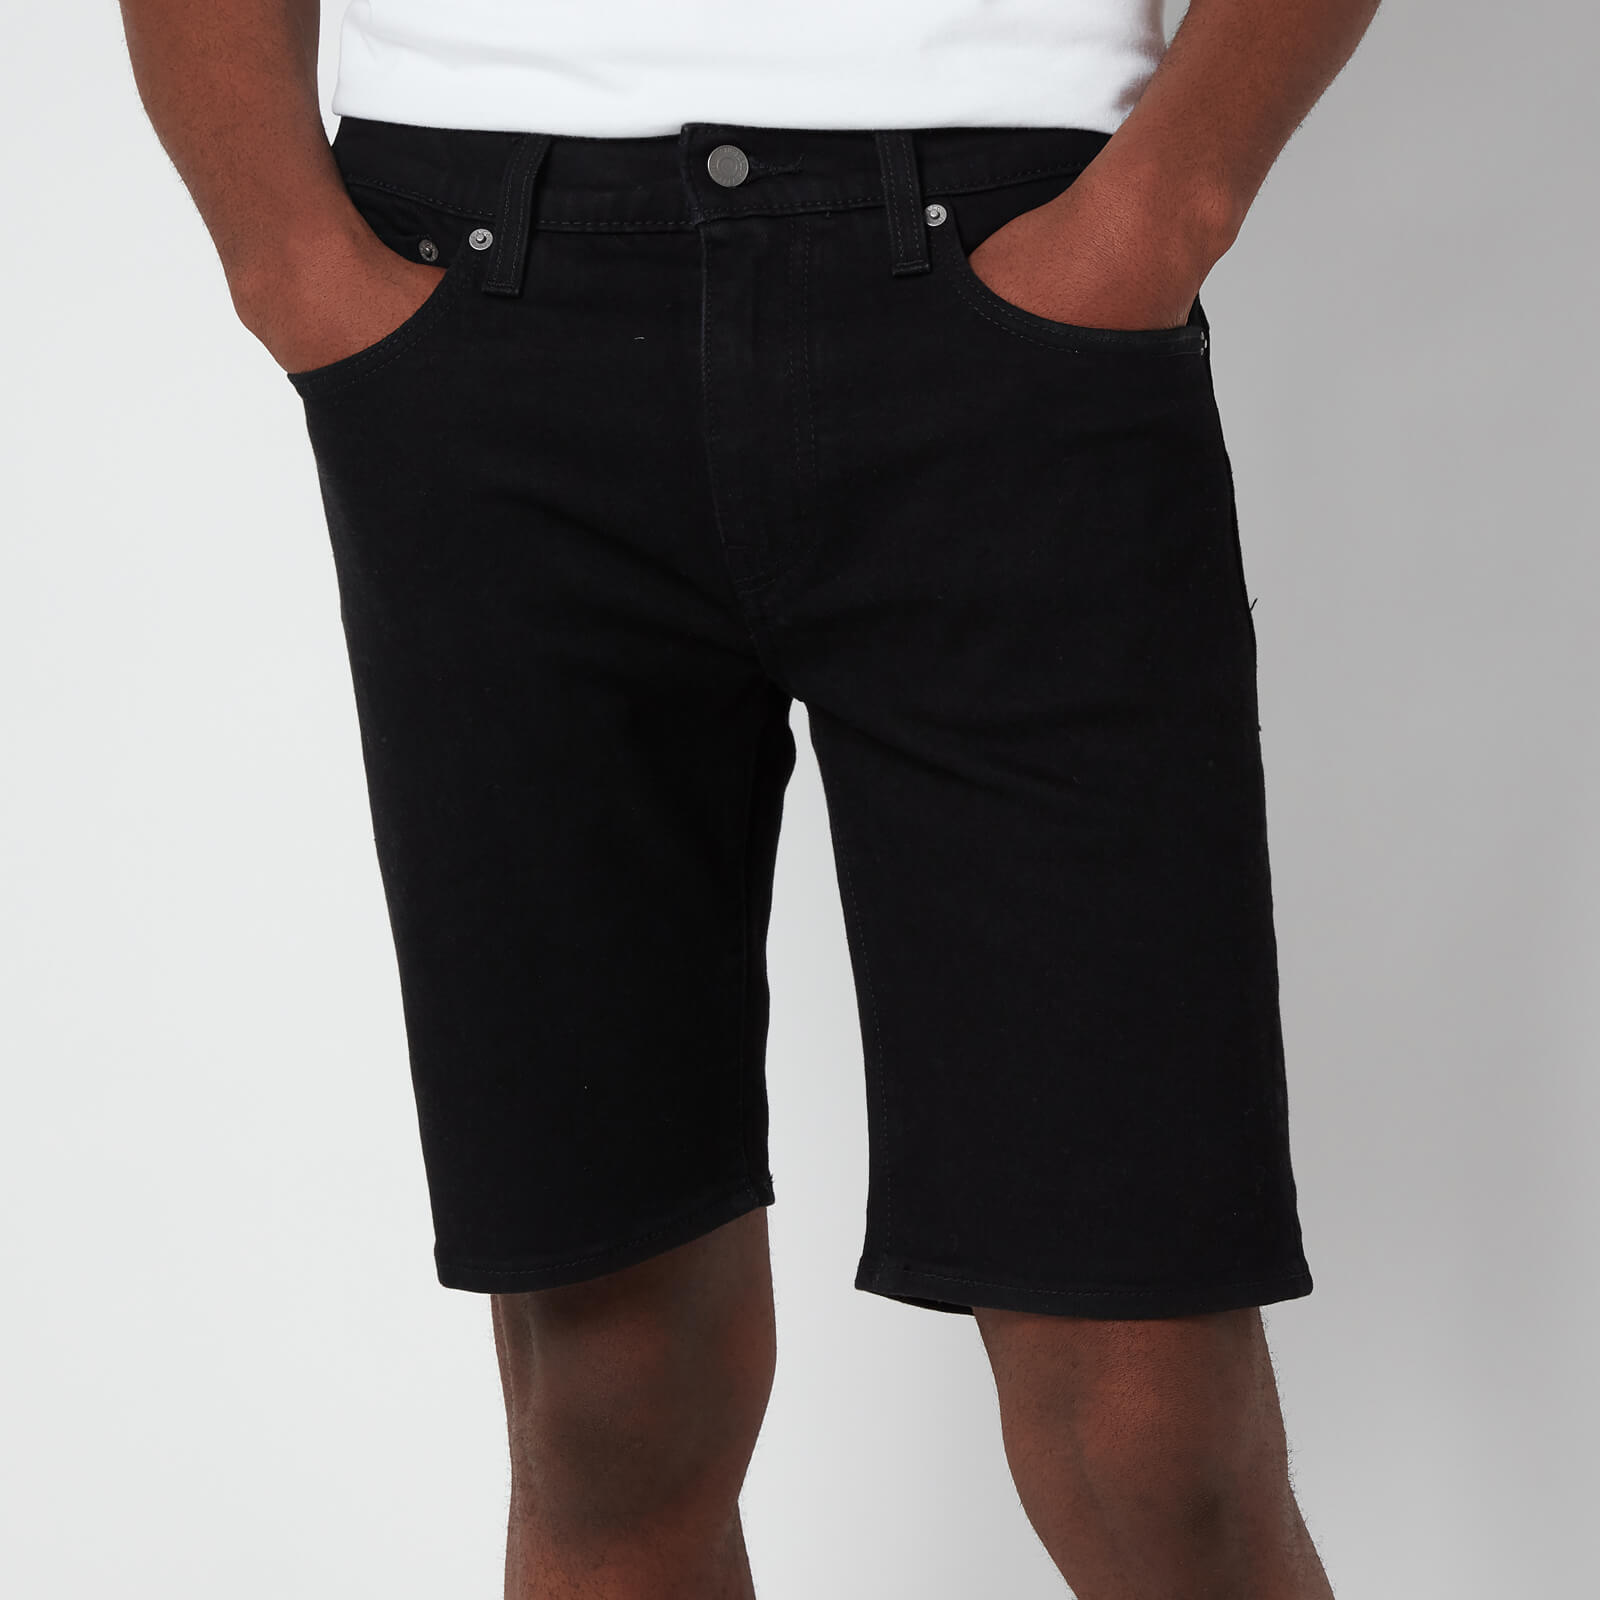 Levi's Men's 405 Standard Shorts - Black Rinse - W30